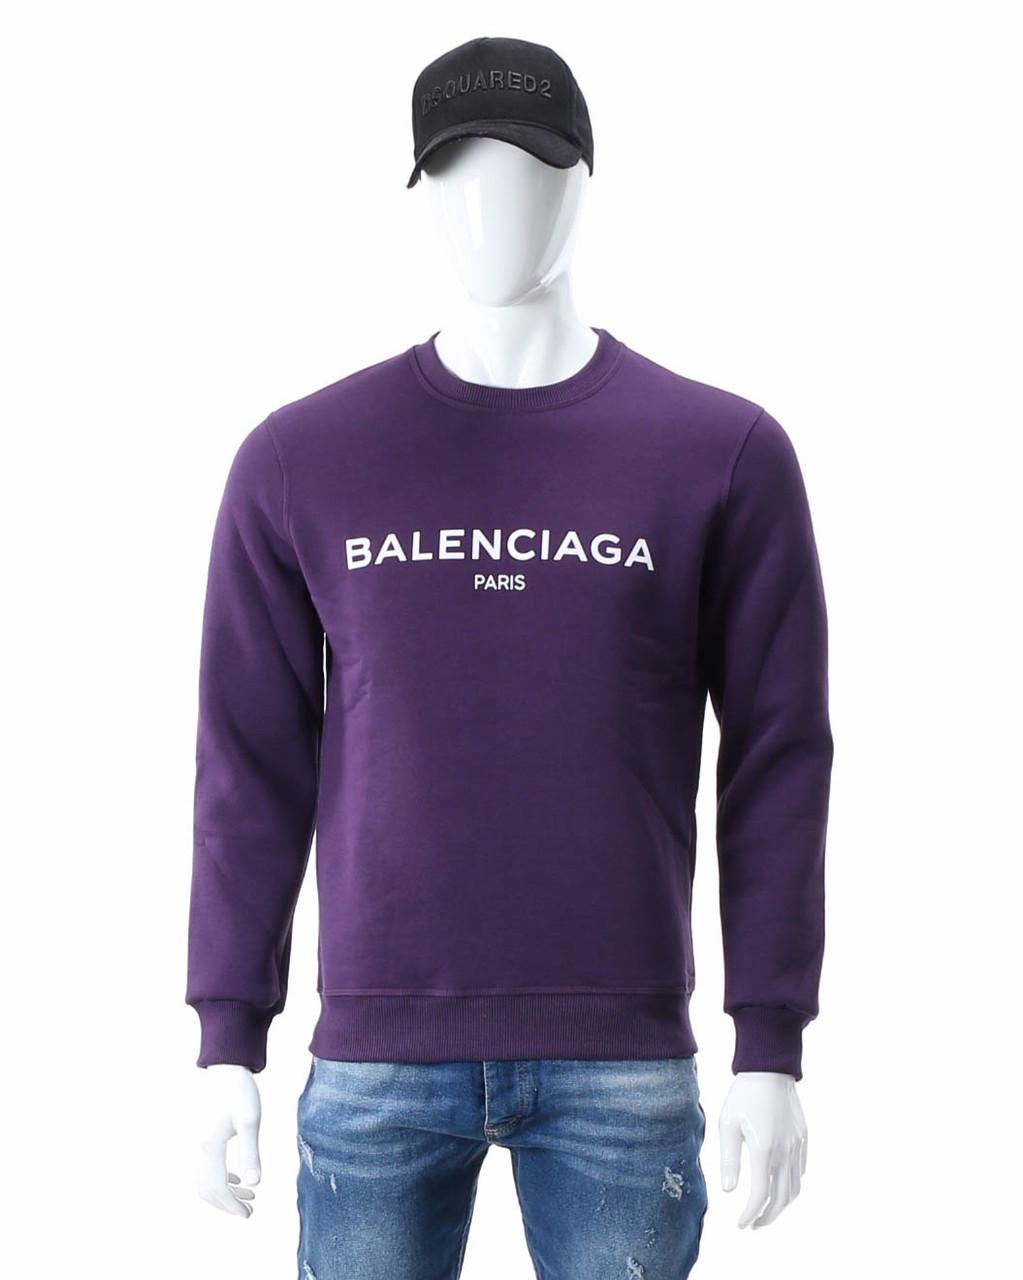 Свитшот осень-зима фиолетовый BALENCIAGA с лого PUR L(Р) 20-510-003